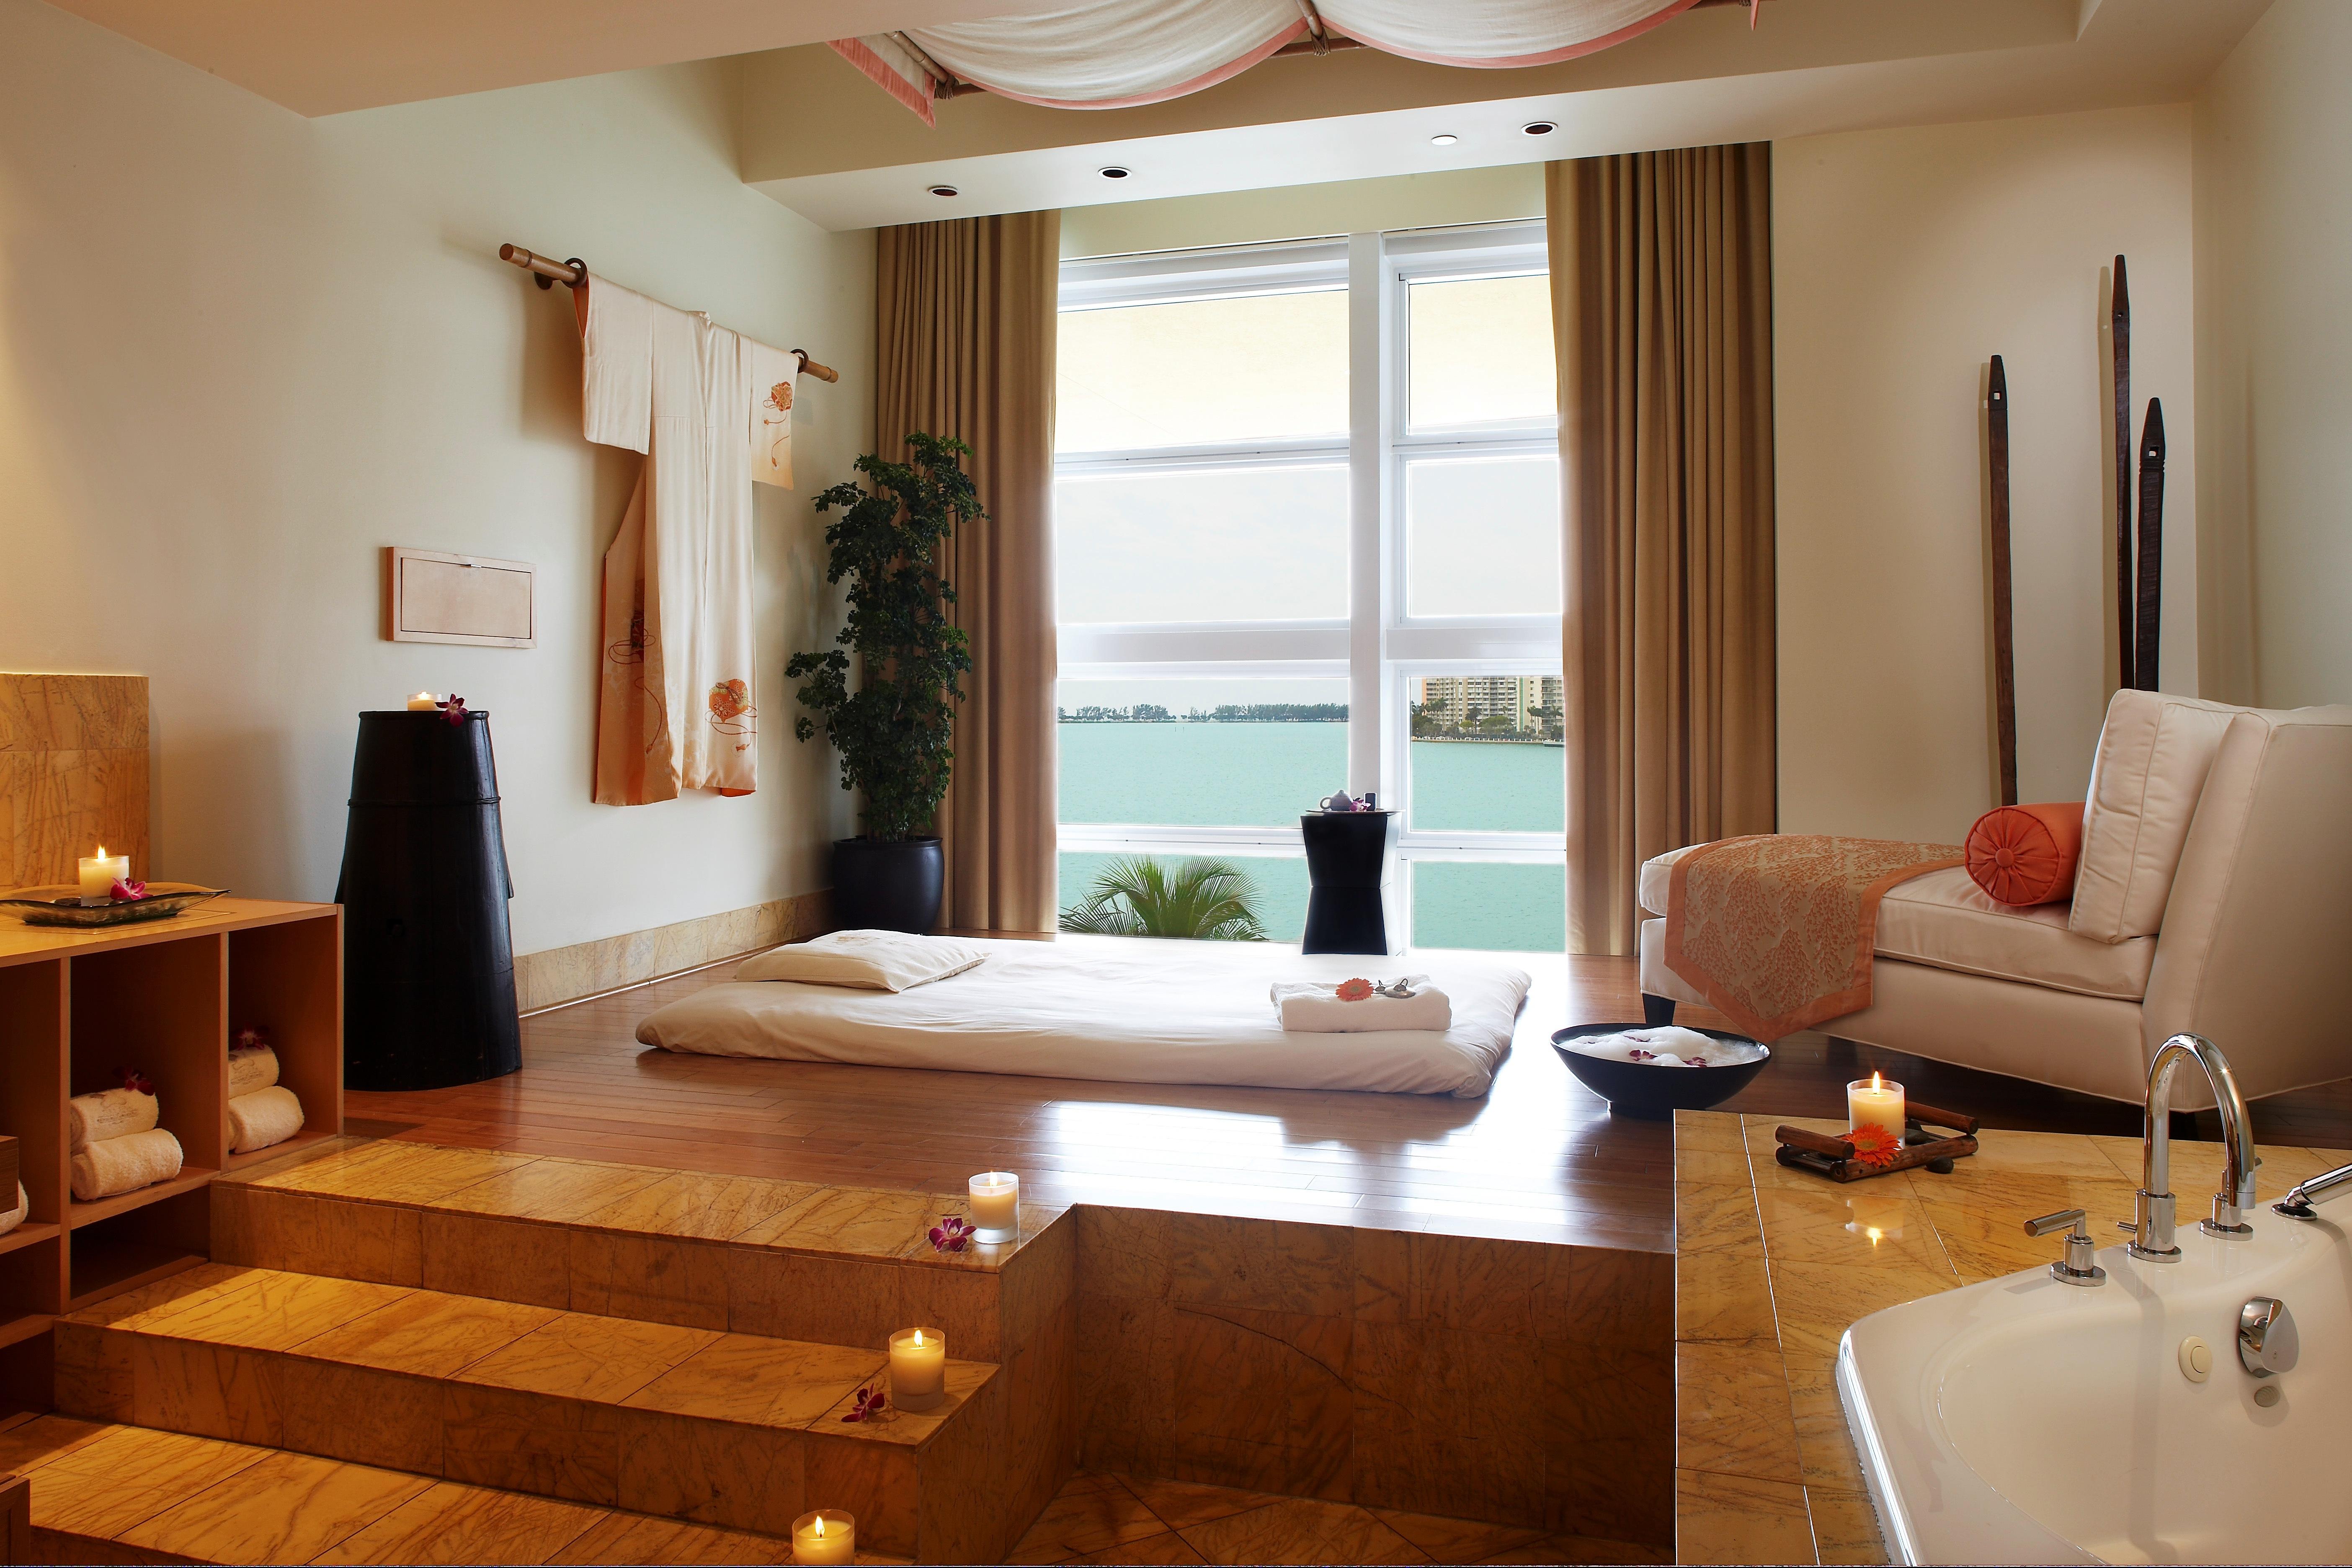 интерьер комната окна диван interior bathroom Windows sofa  № 3530229 загрузить